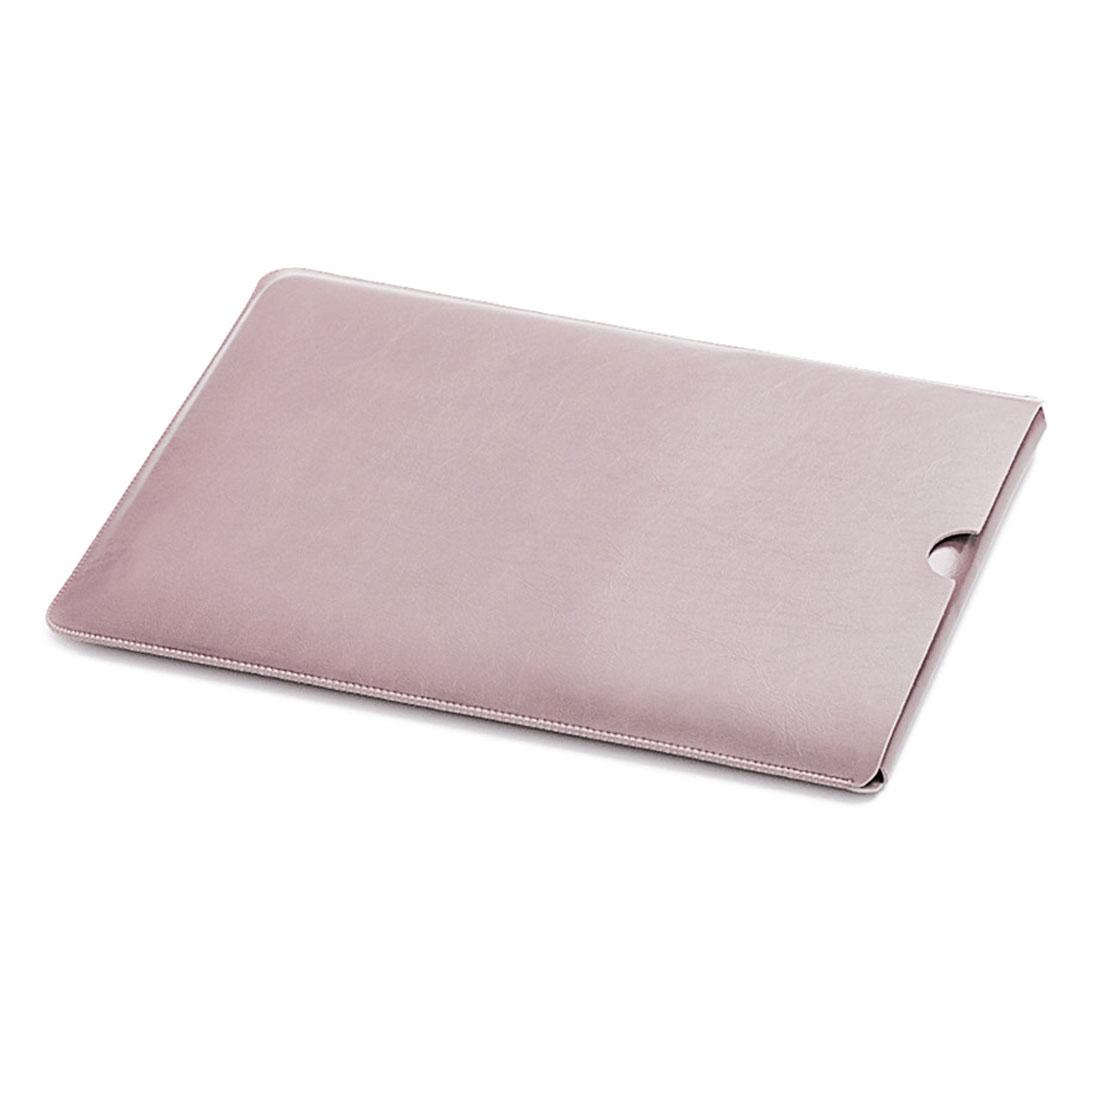 13 Inch Laptop Sleeve Case Leather Bag Rose Pink for Macbook ASUS ACER LENOVO Netbook